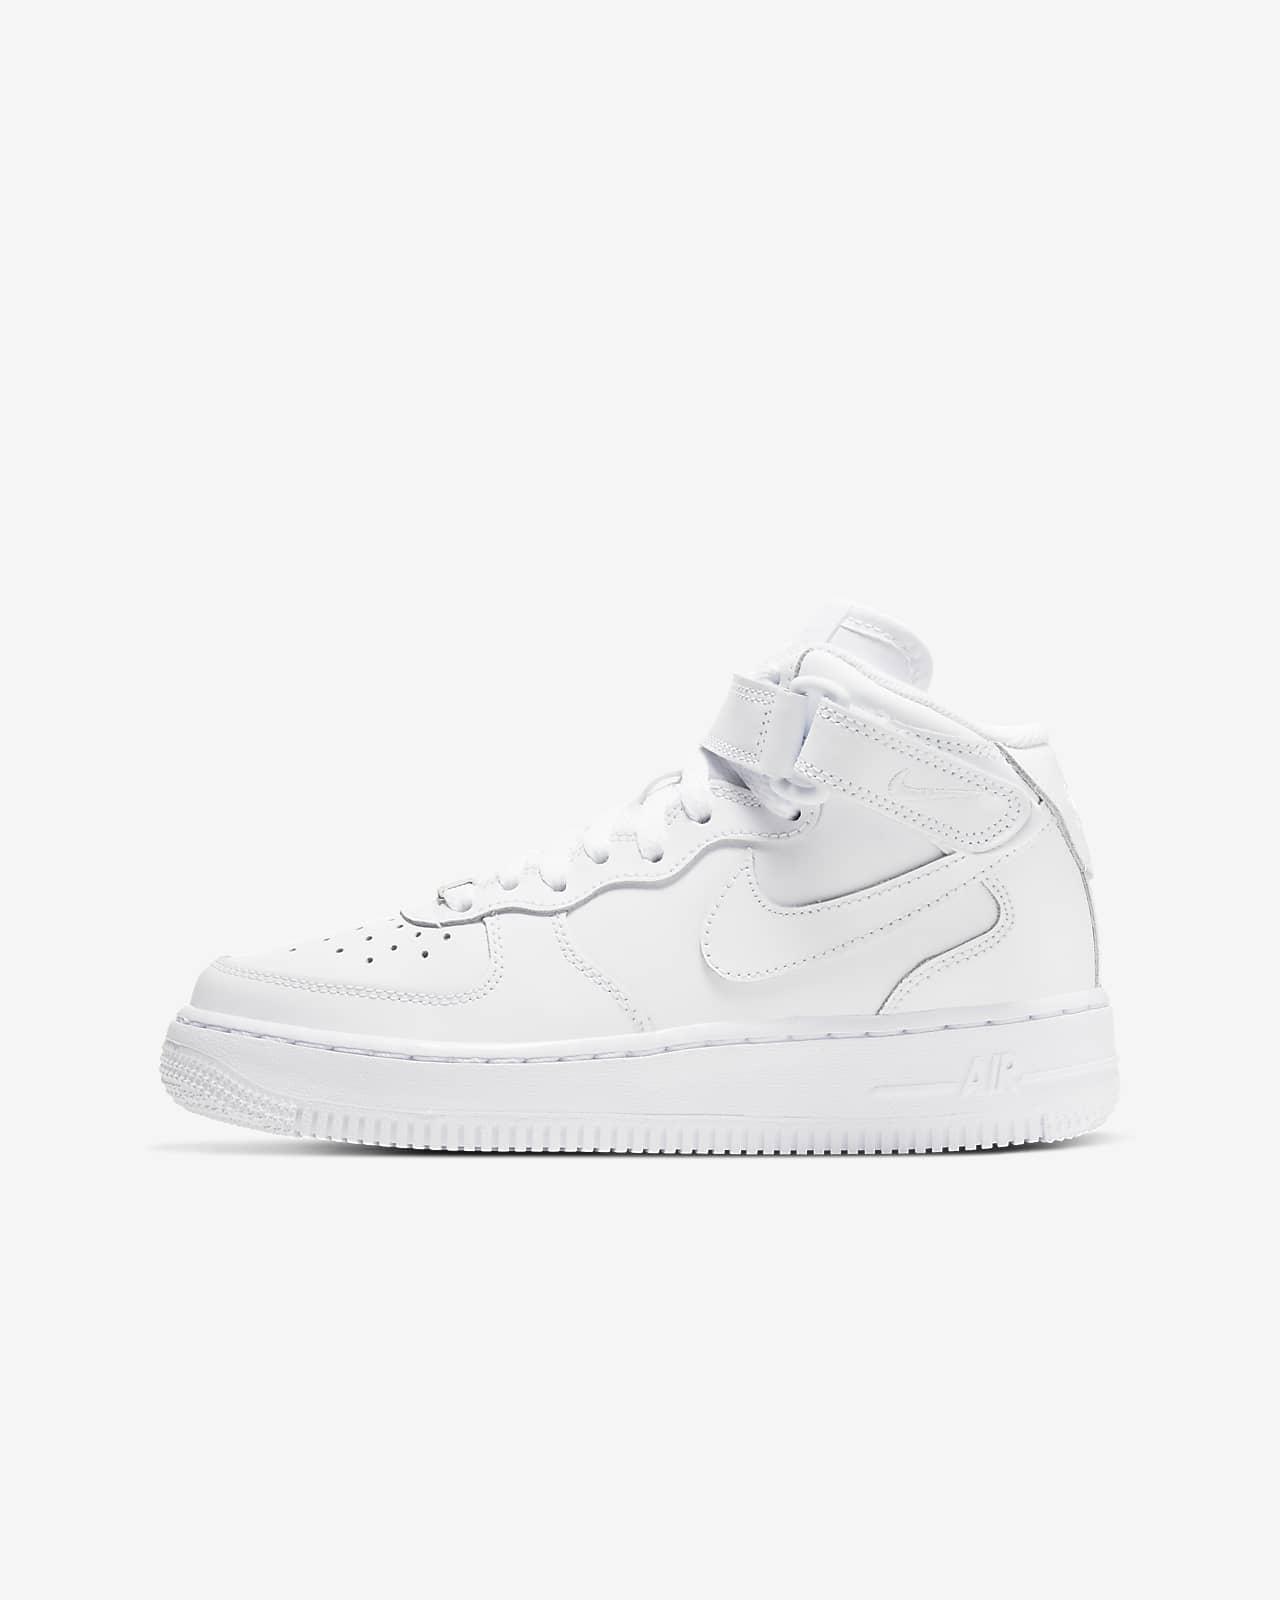 Nike Air Force 1 中筒大童鞋款